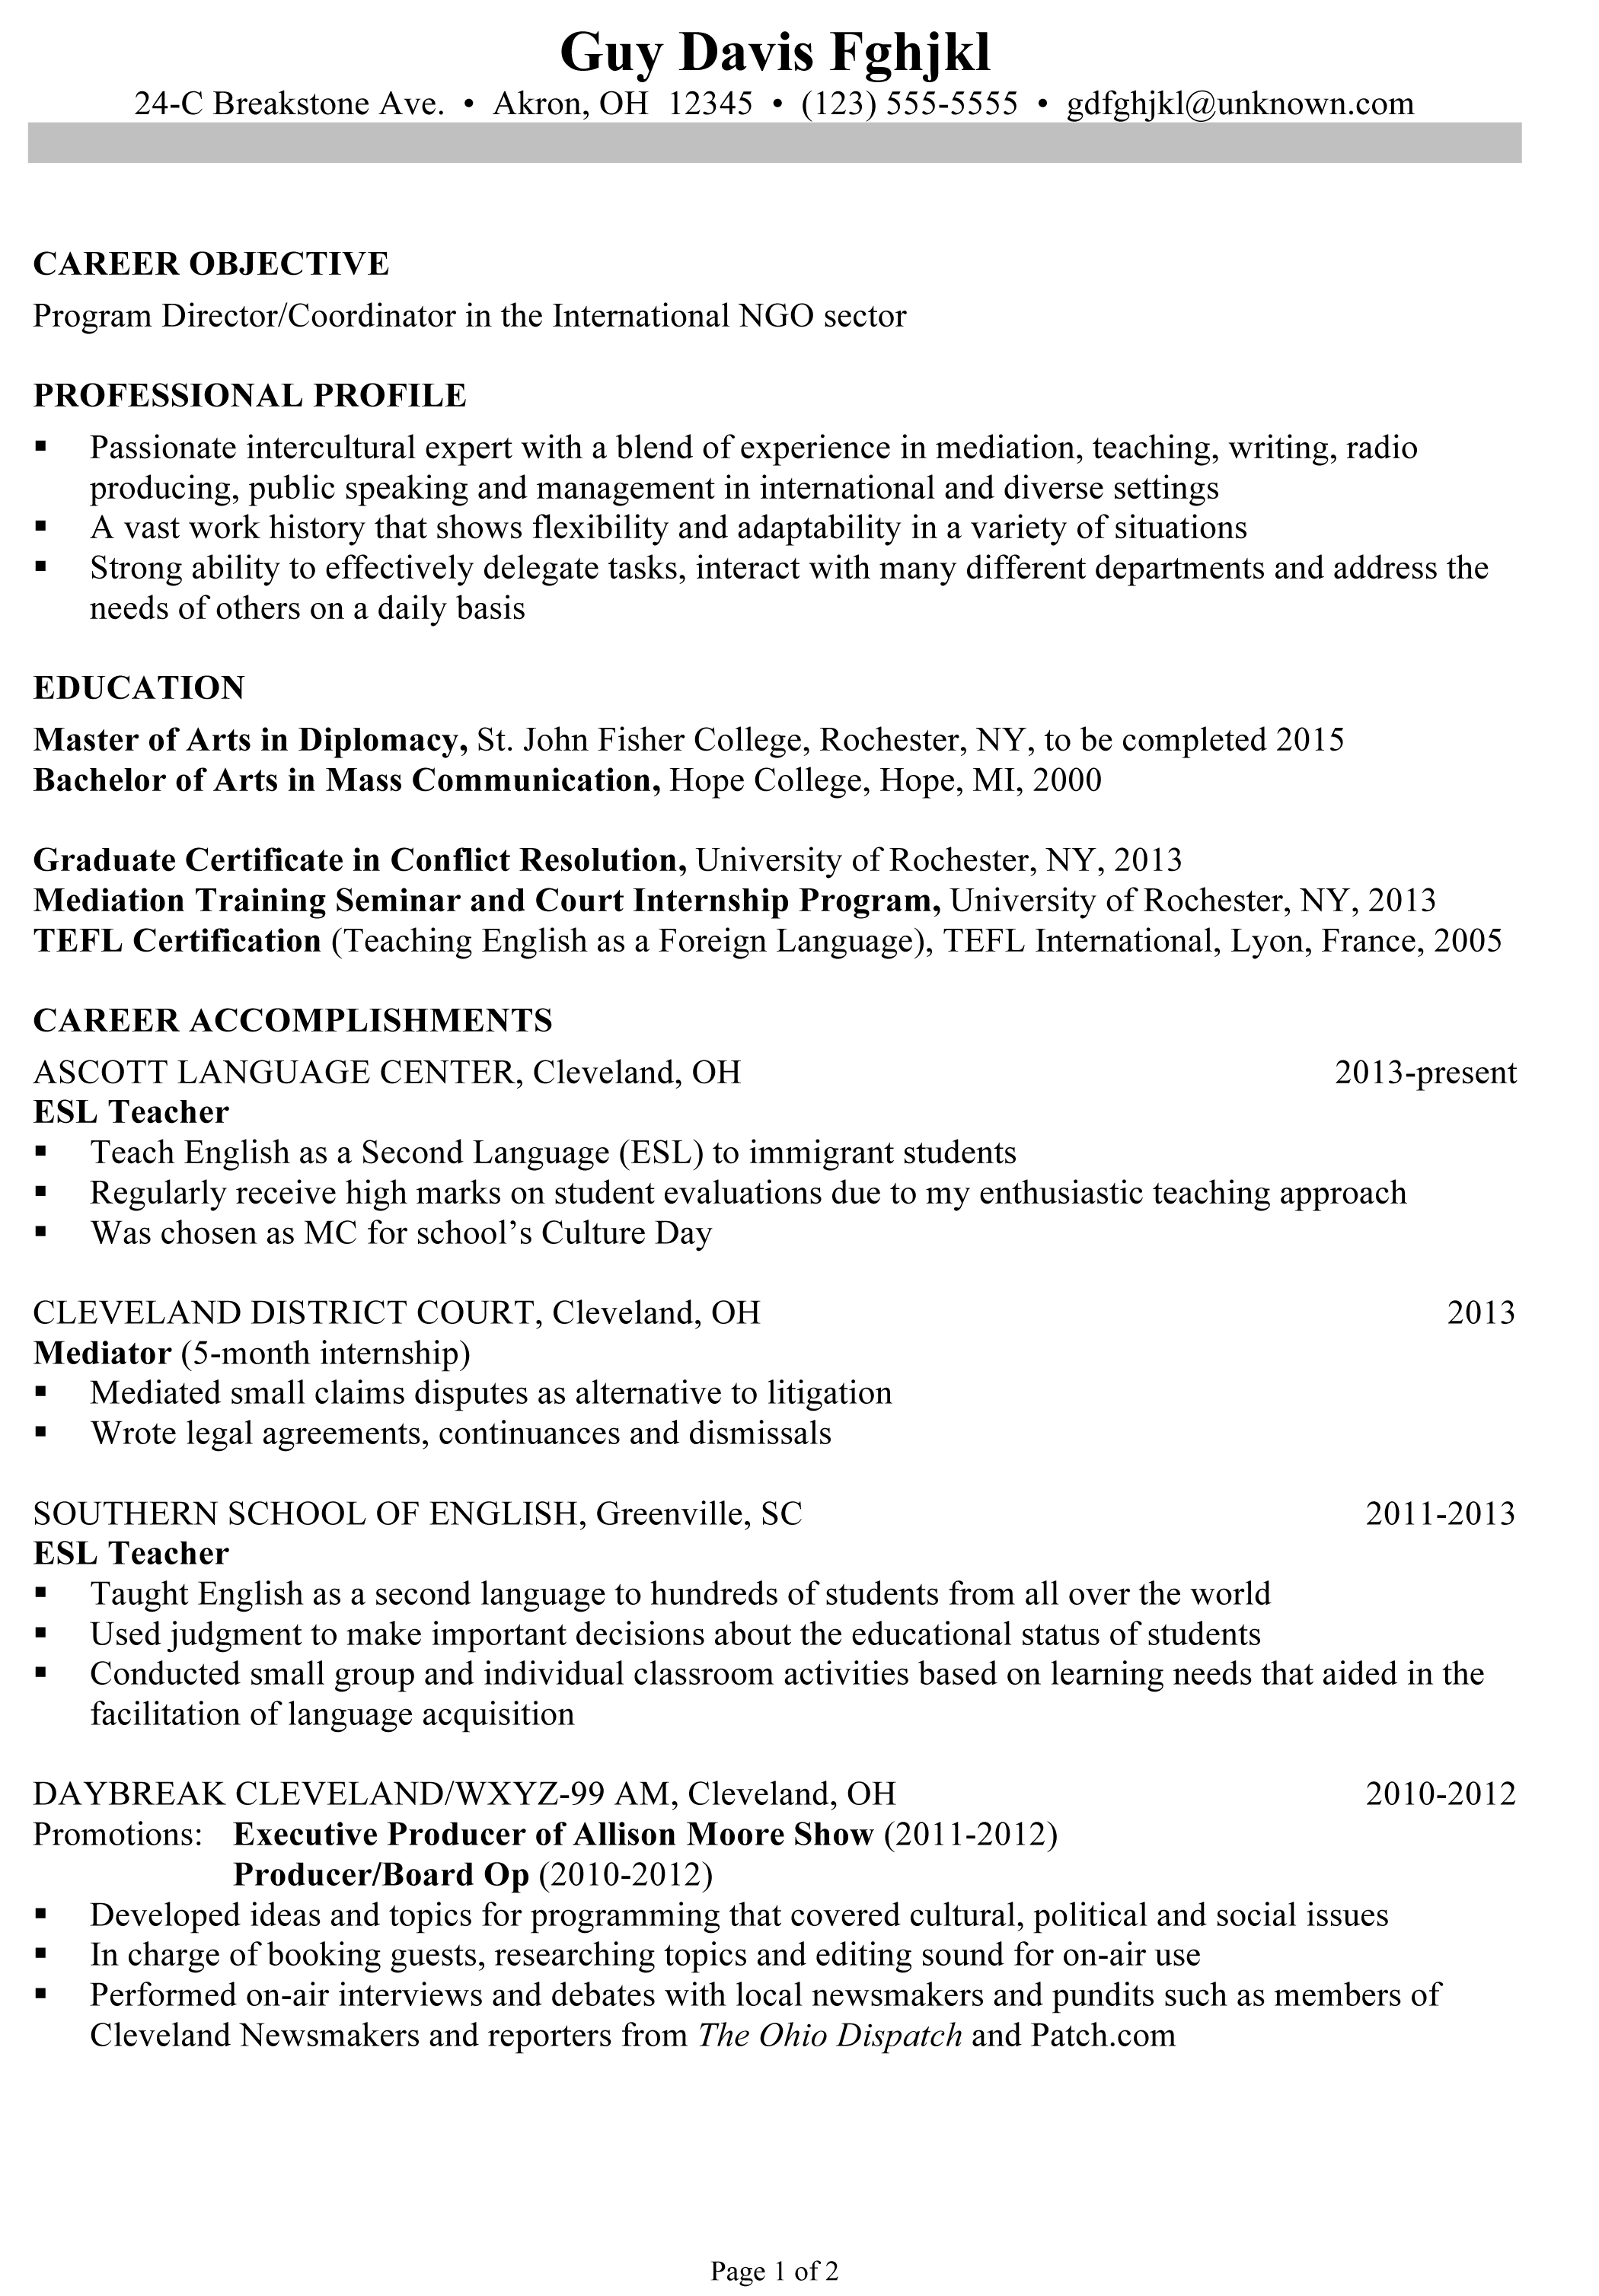 Chronological Resume Sample: Program Director Coordinator ...